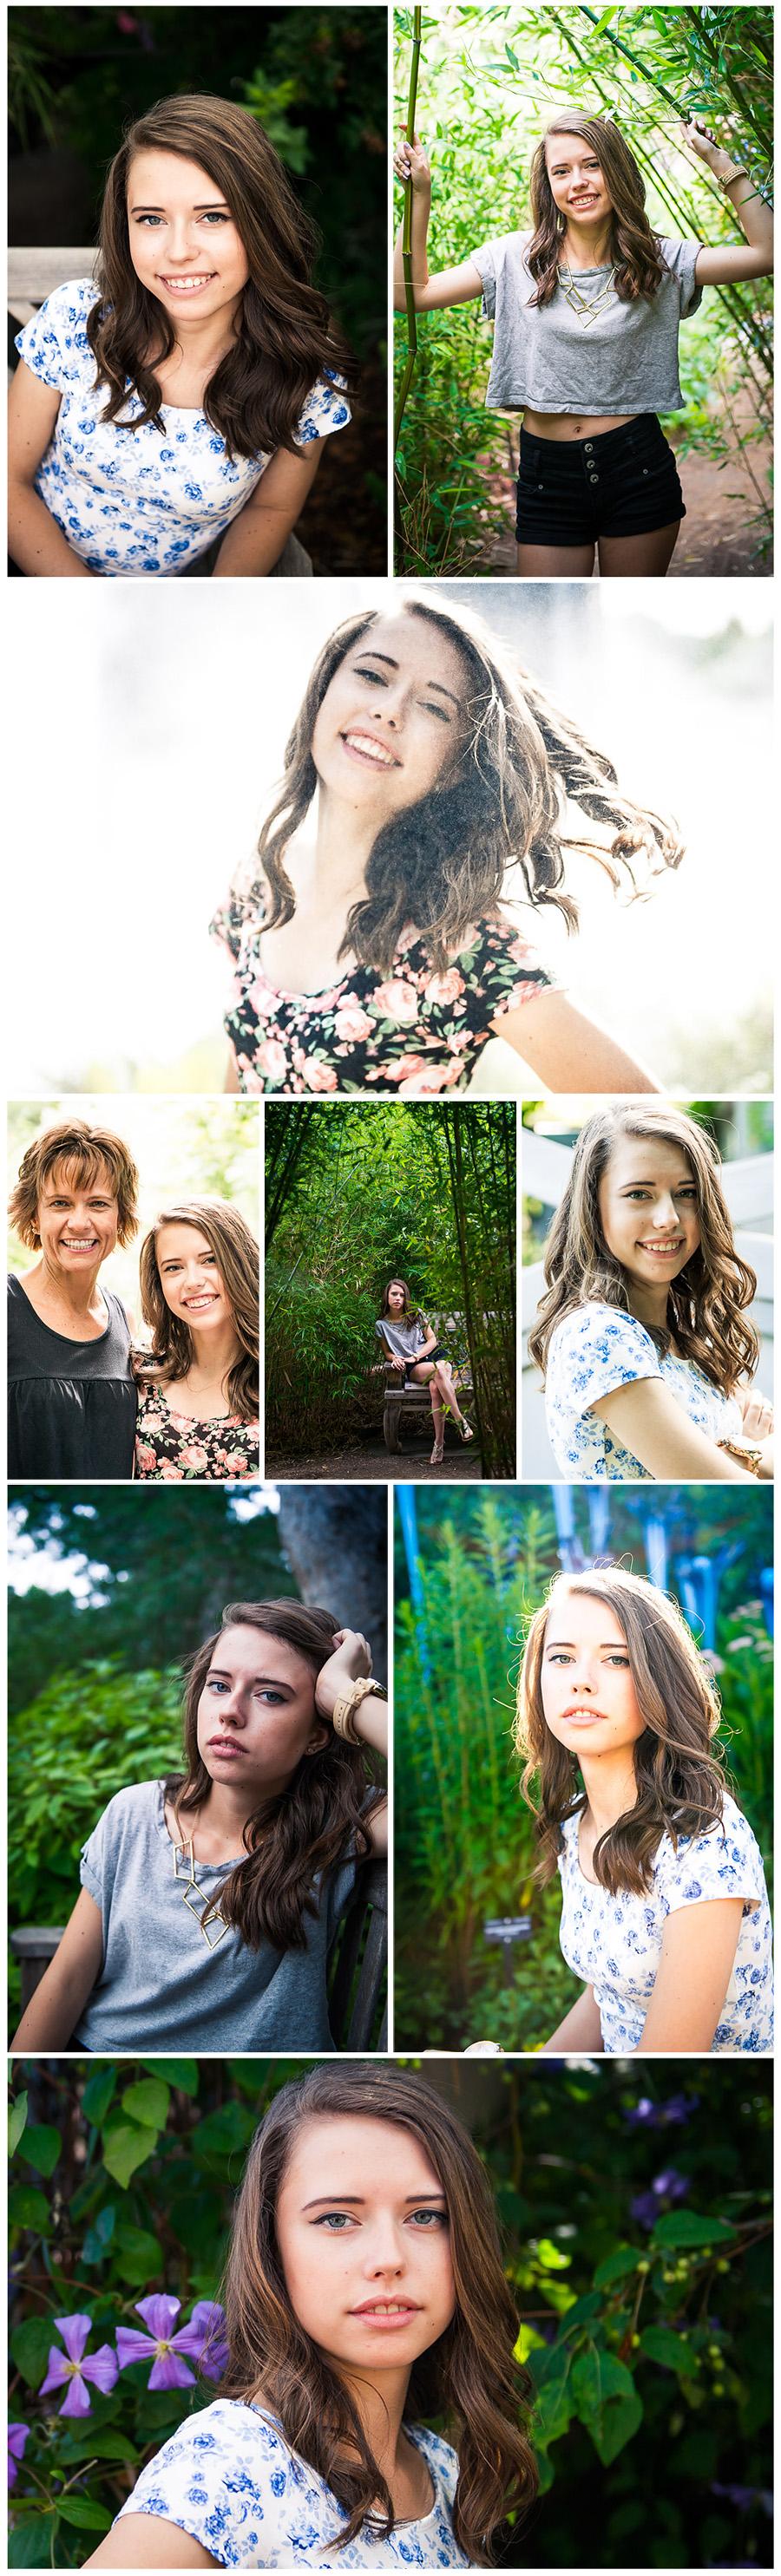 Senior photo session - Berkeley collage 1